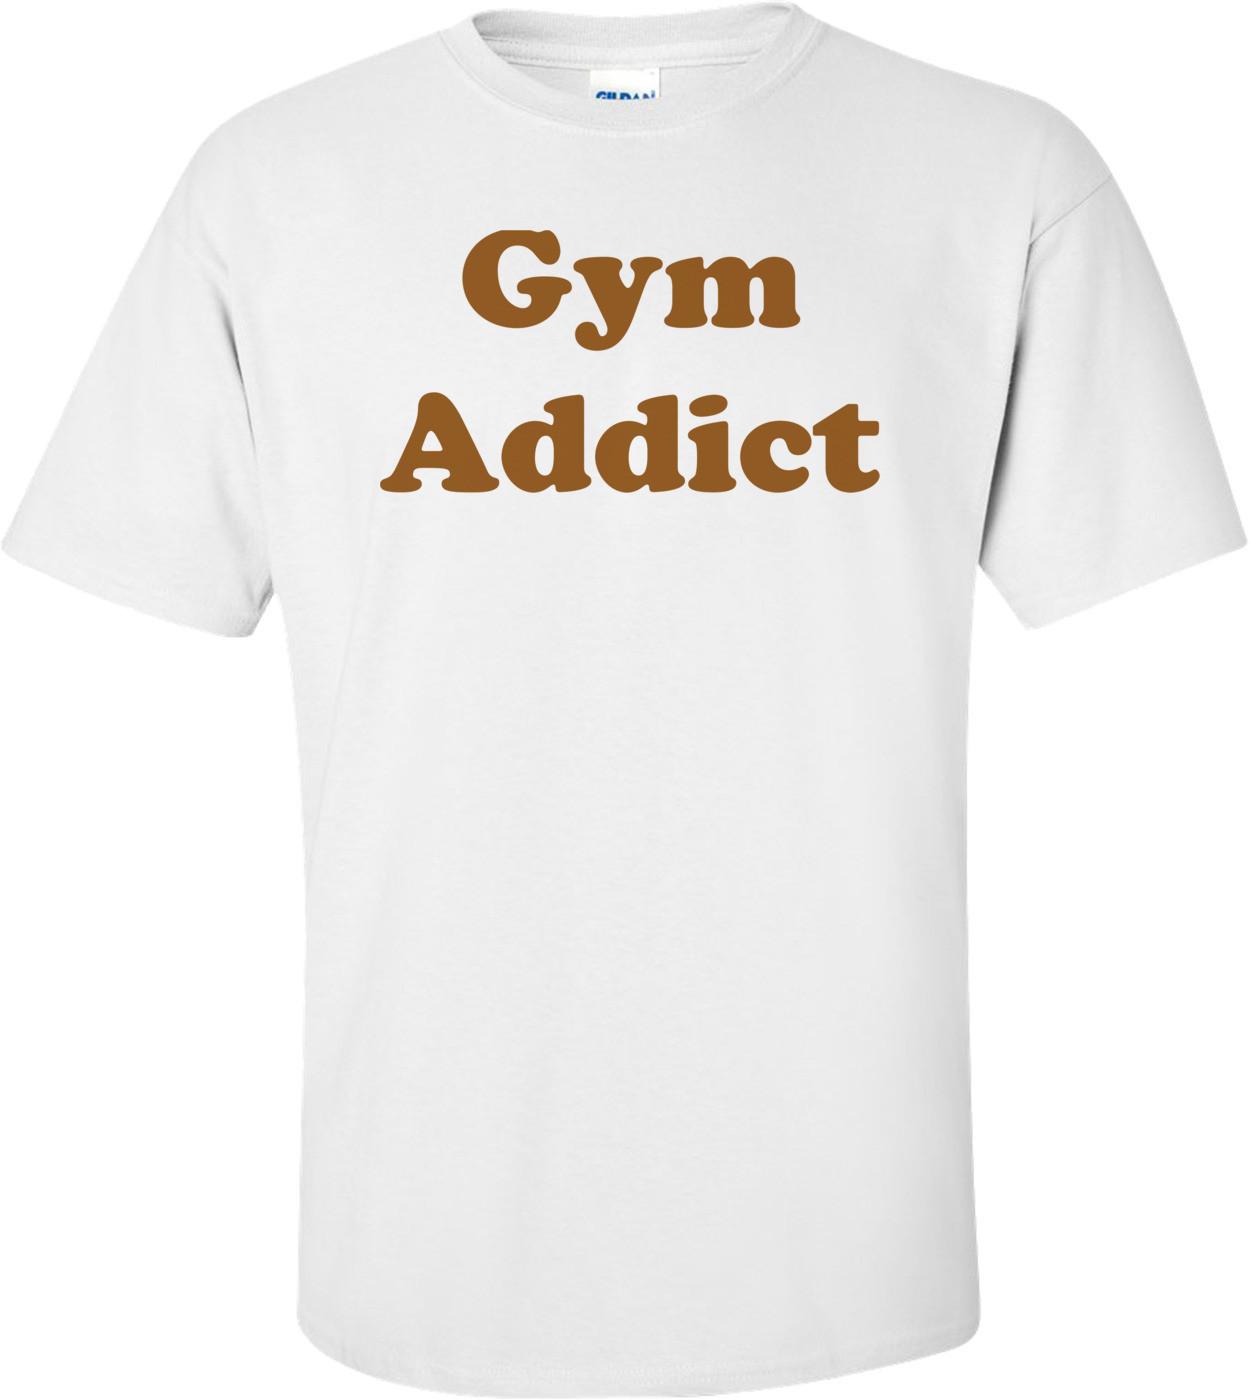 Gym Addict Shirt